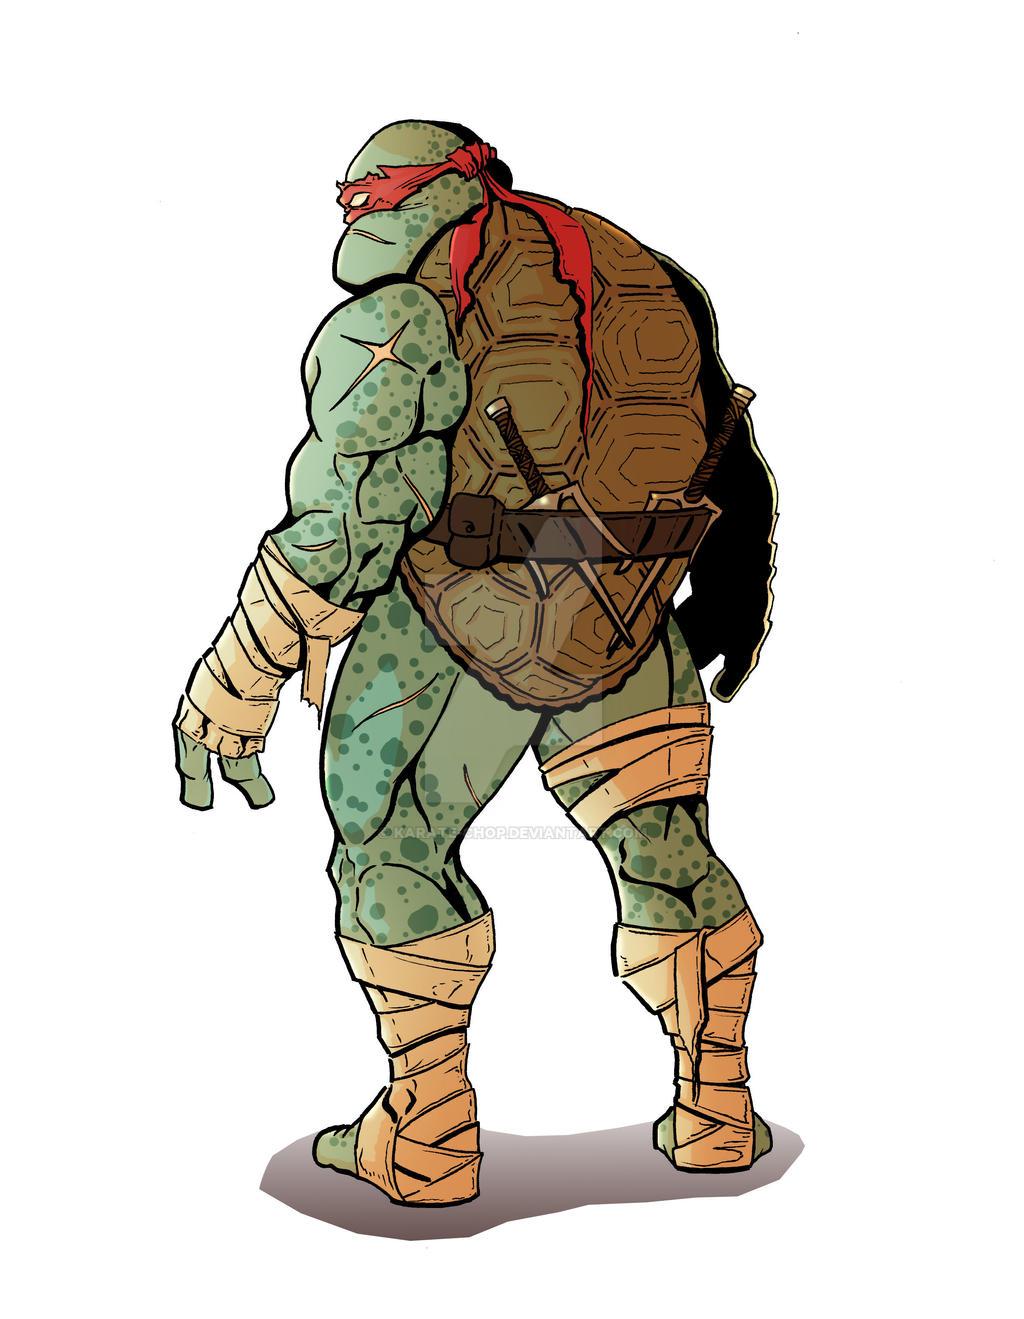 Raphael is cool but crude. I imagine Raphael is kind of a